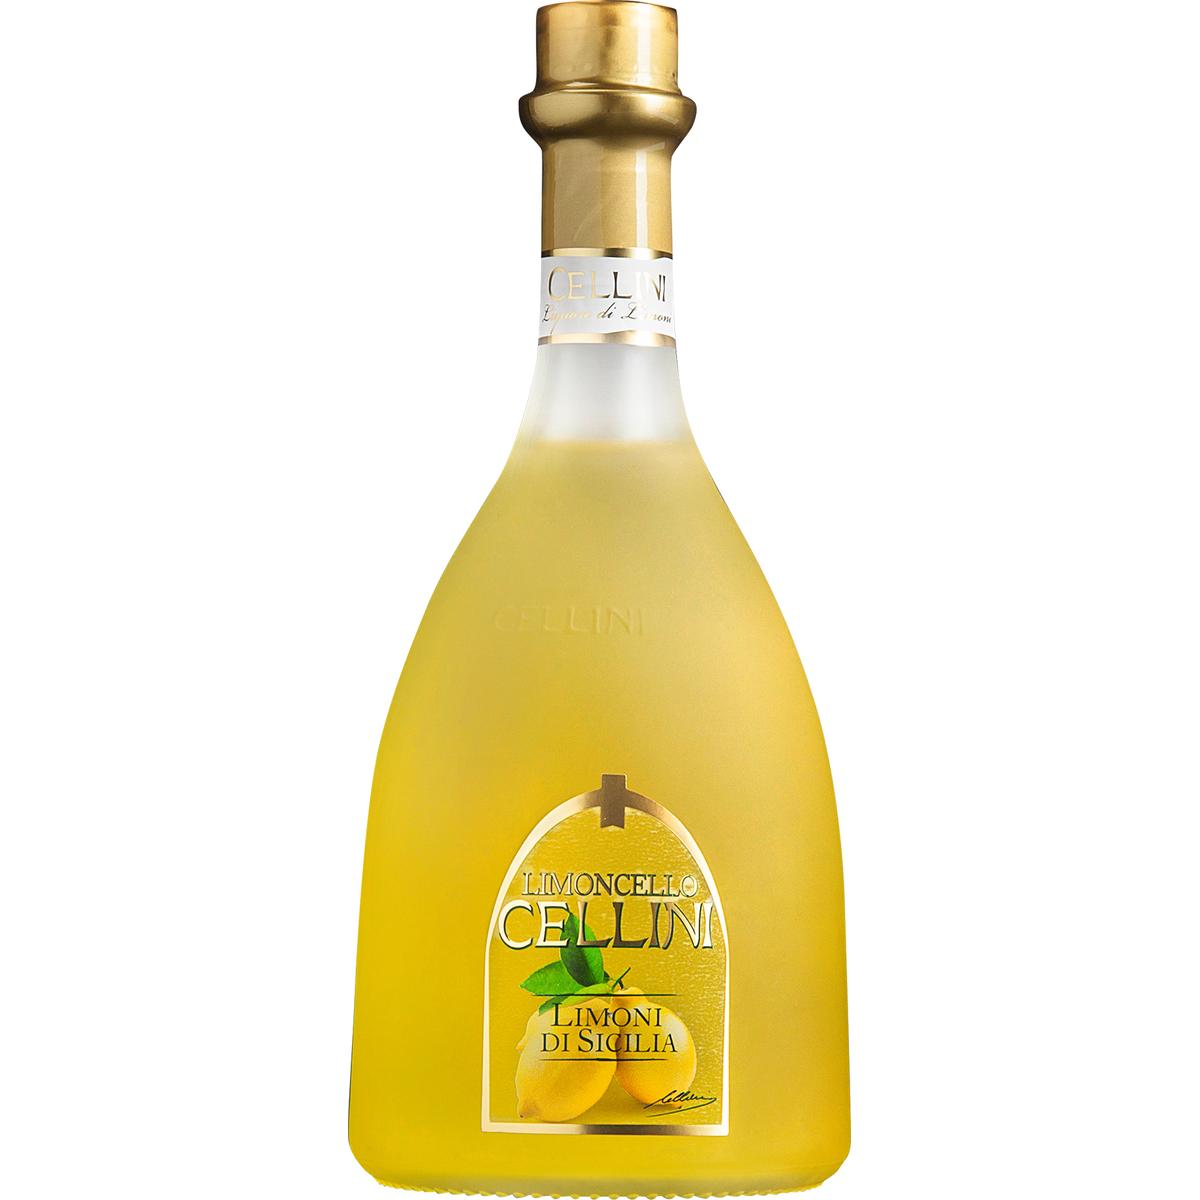 Cellini Limoncello 30% 0,7L   Liköre   Spirituosen   Sortiment ...